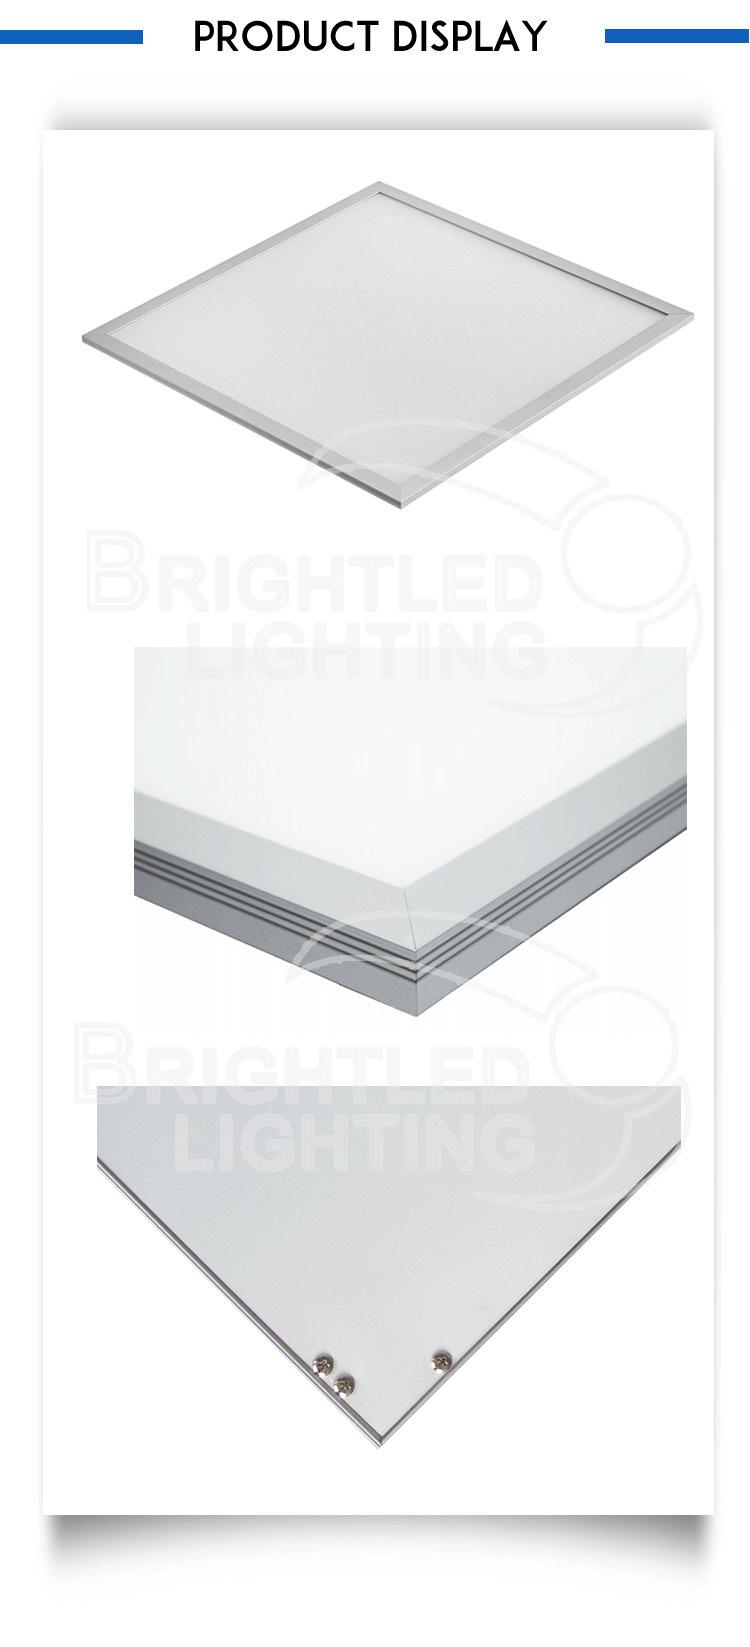 Super Bright 600*600mm LED Ceiling Down Panel Light